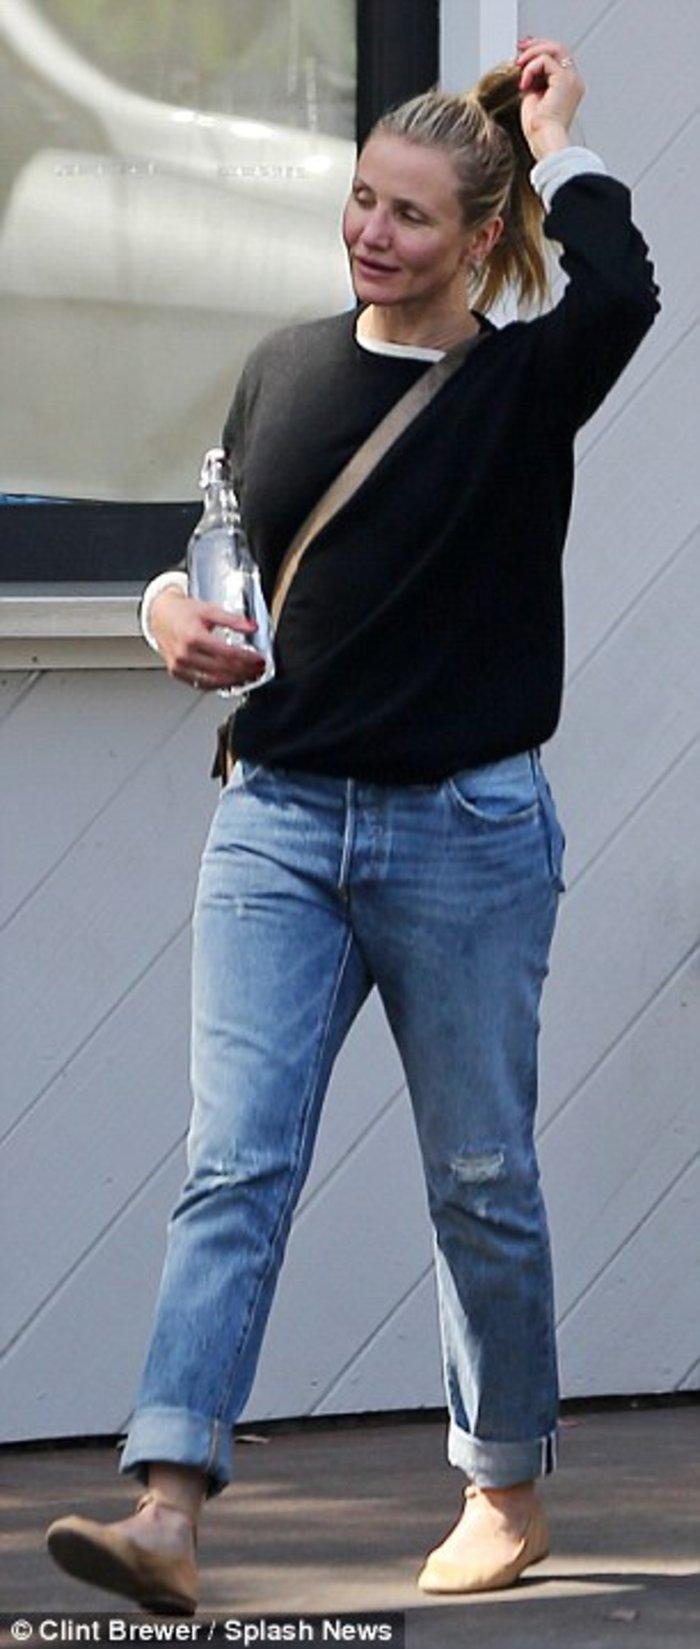 H απογοητευτική εμφάνιση της Κάμερον Ντίαζ στον δρόμο χωρίς μακιγιάζ - εικόνα 3